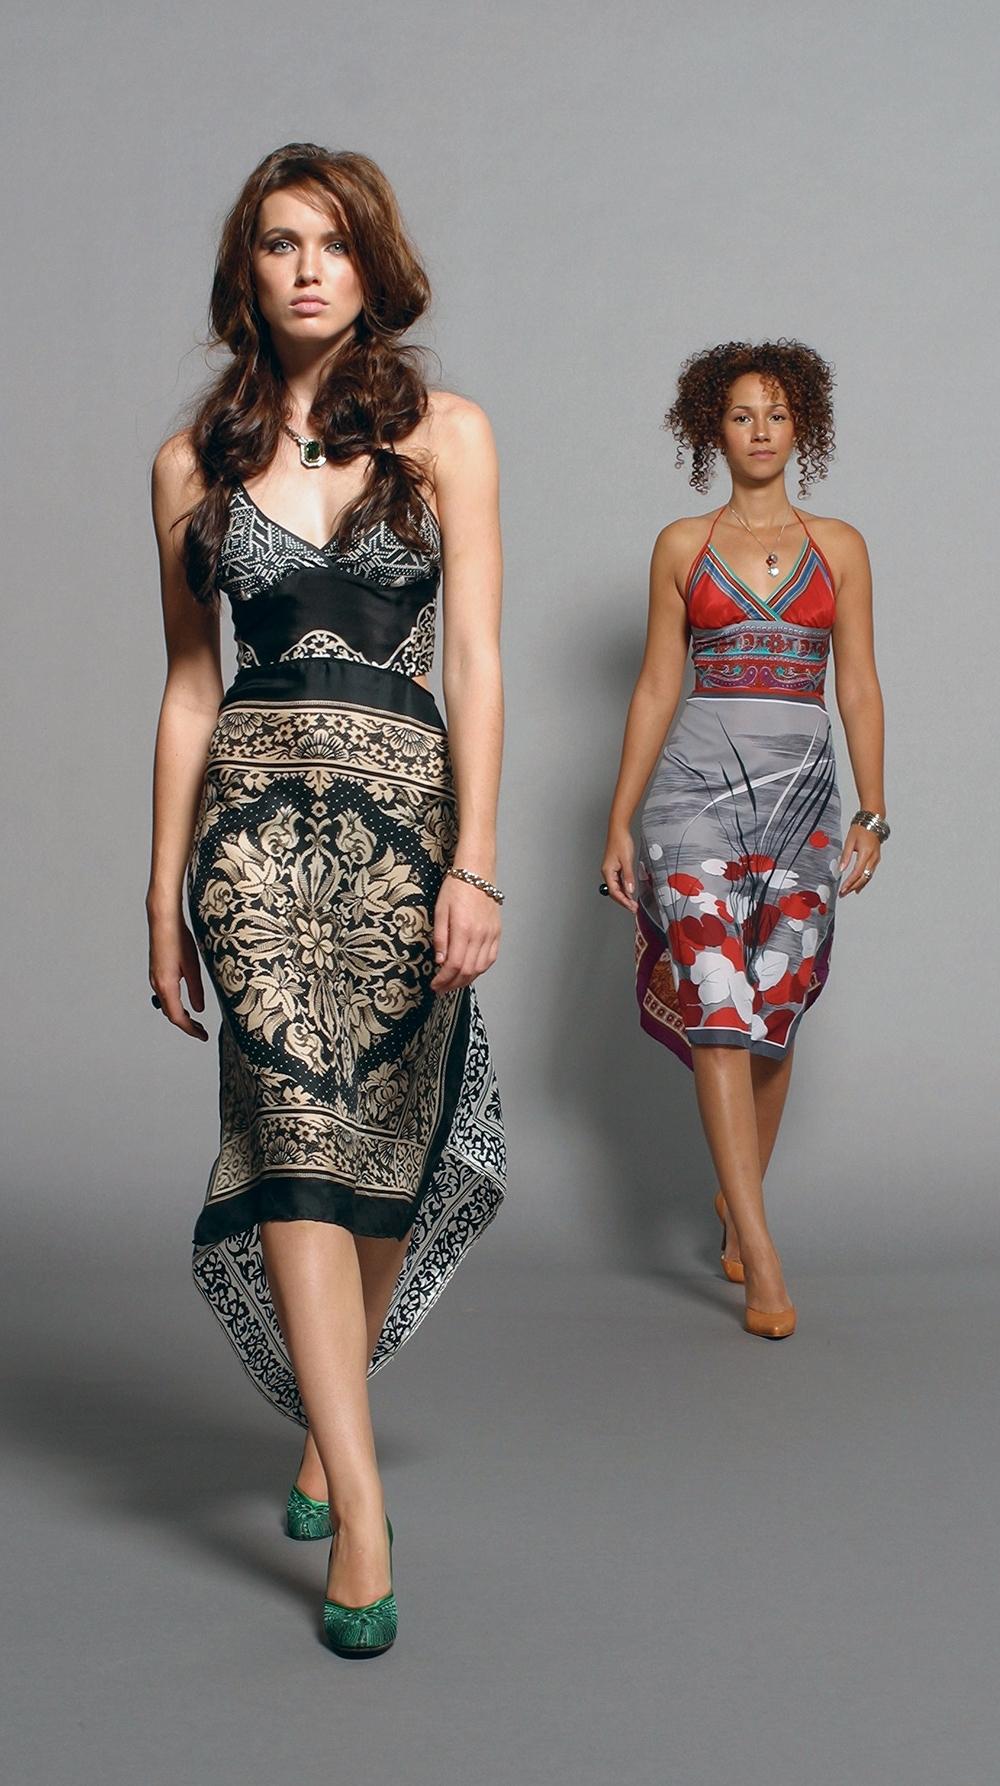 One-of-a-Kind Vintage Scarf Dresses